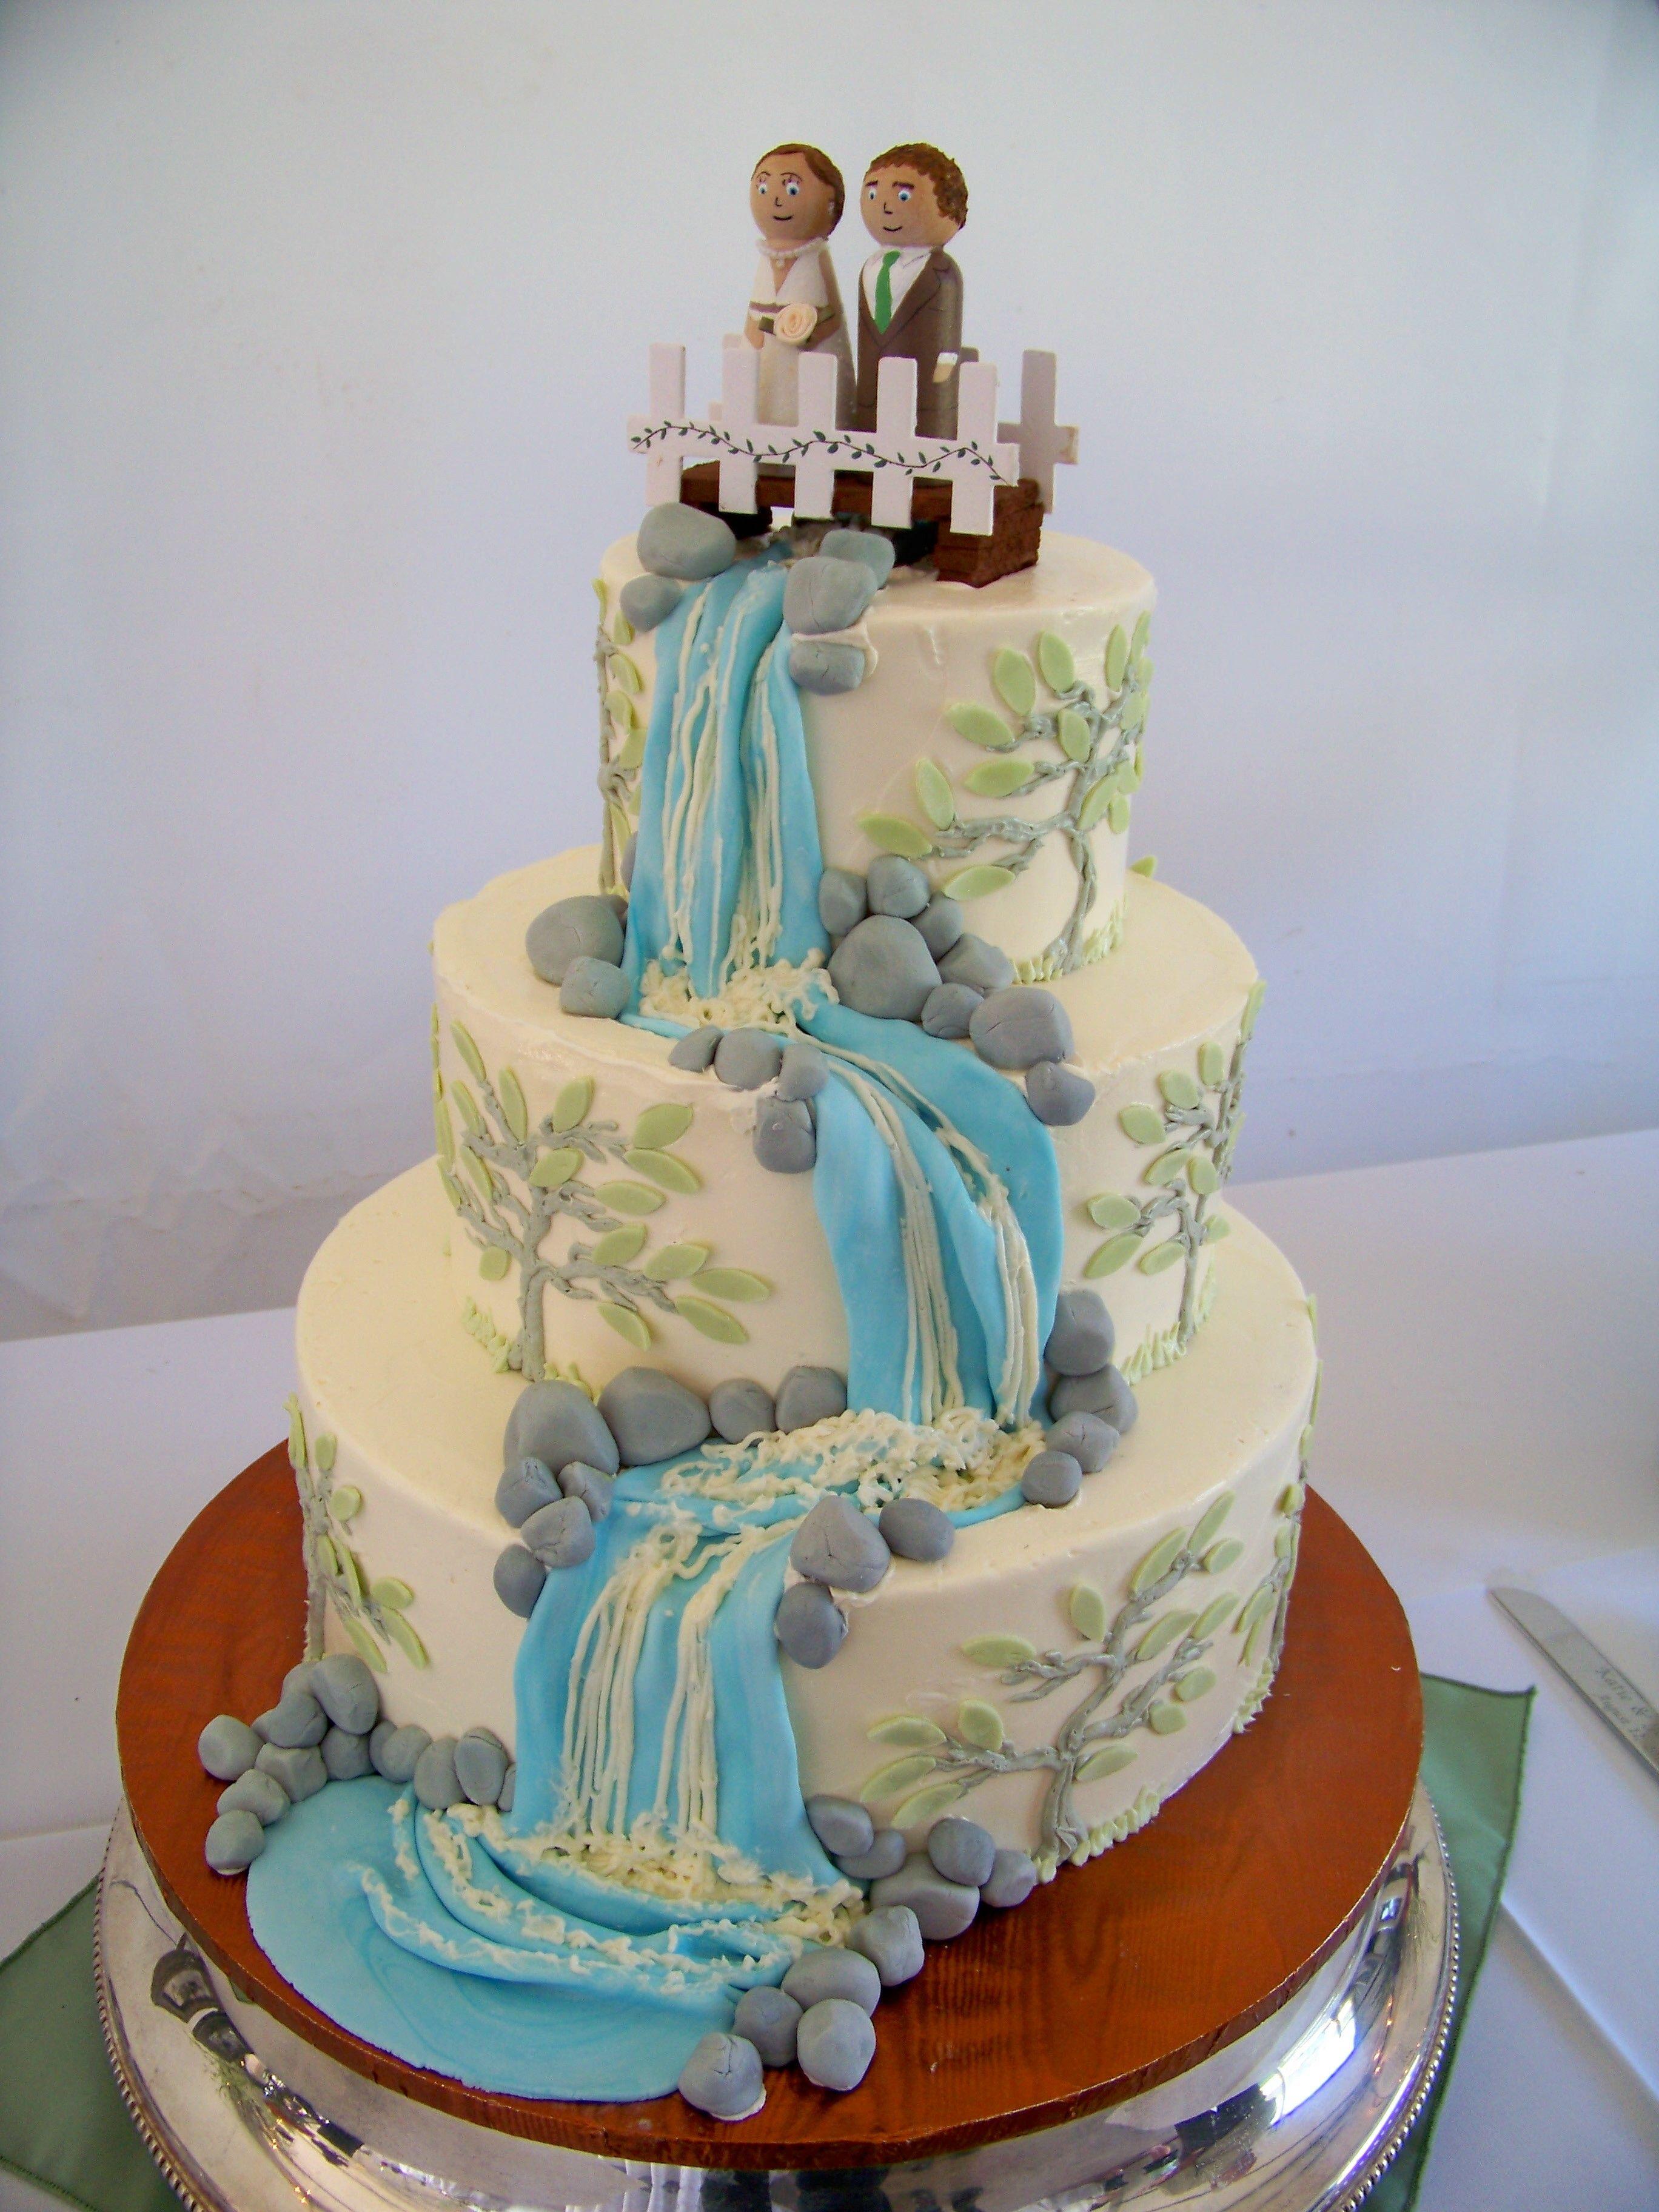 waterfall with rocks wedding cake - Wedding Cake Design Ideas